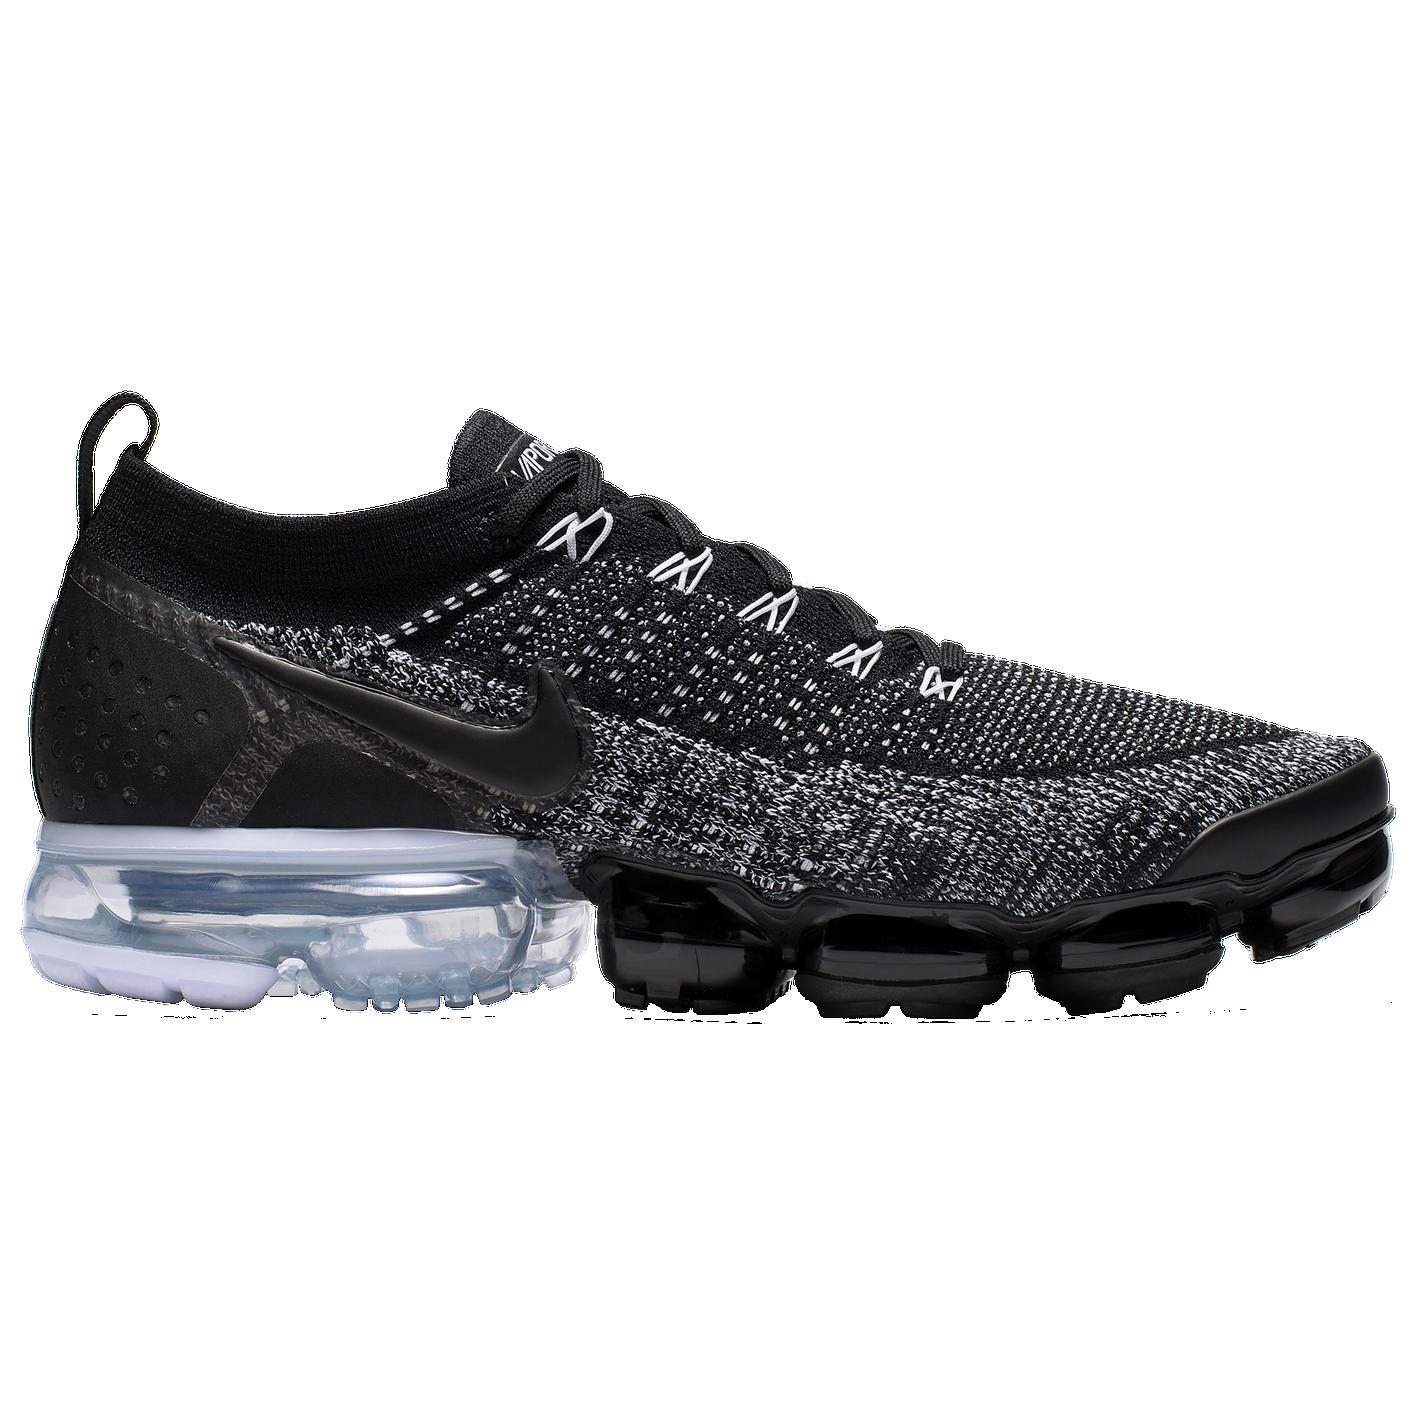 on sale 131dd 6016e Nike Air Vapormax Flyknit 2 - Mens